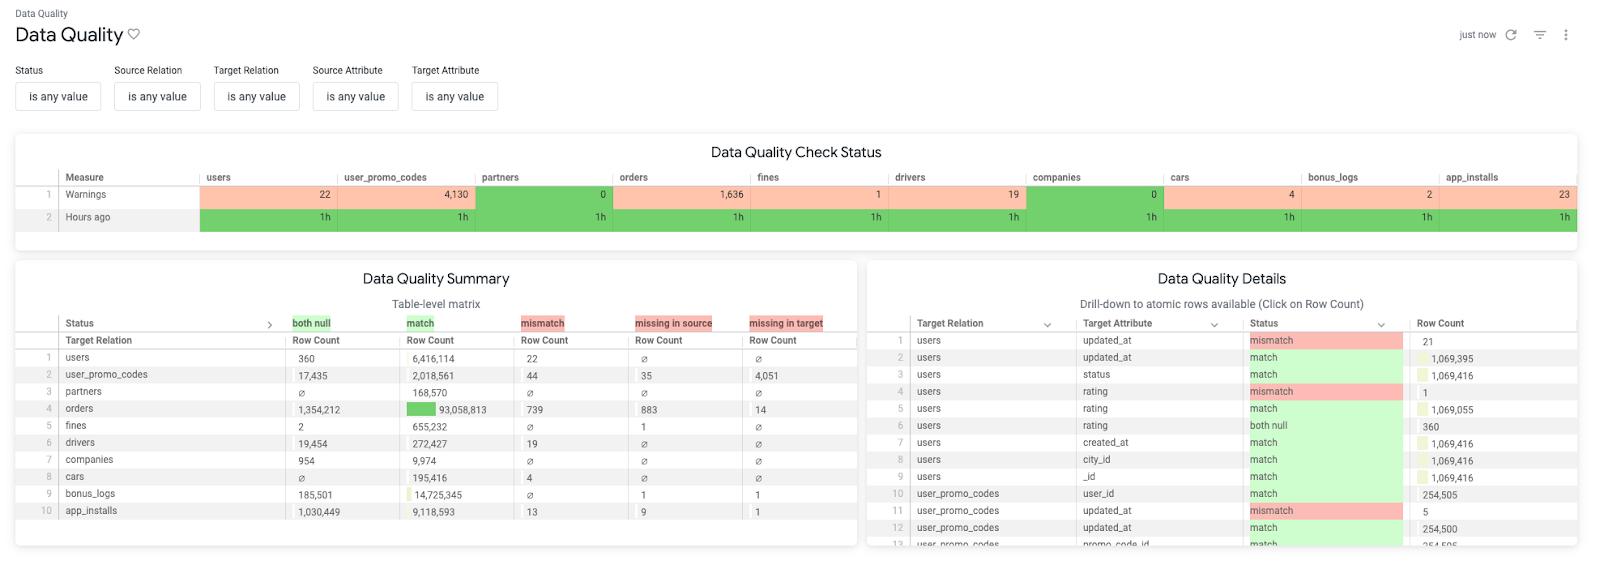 Дашборд статуса Data Quality